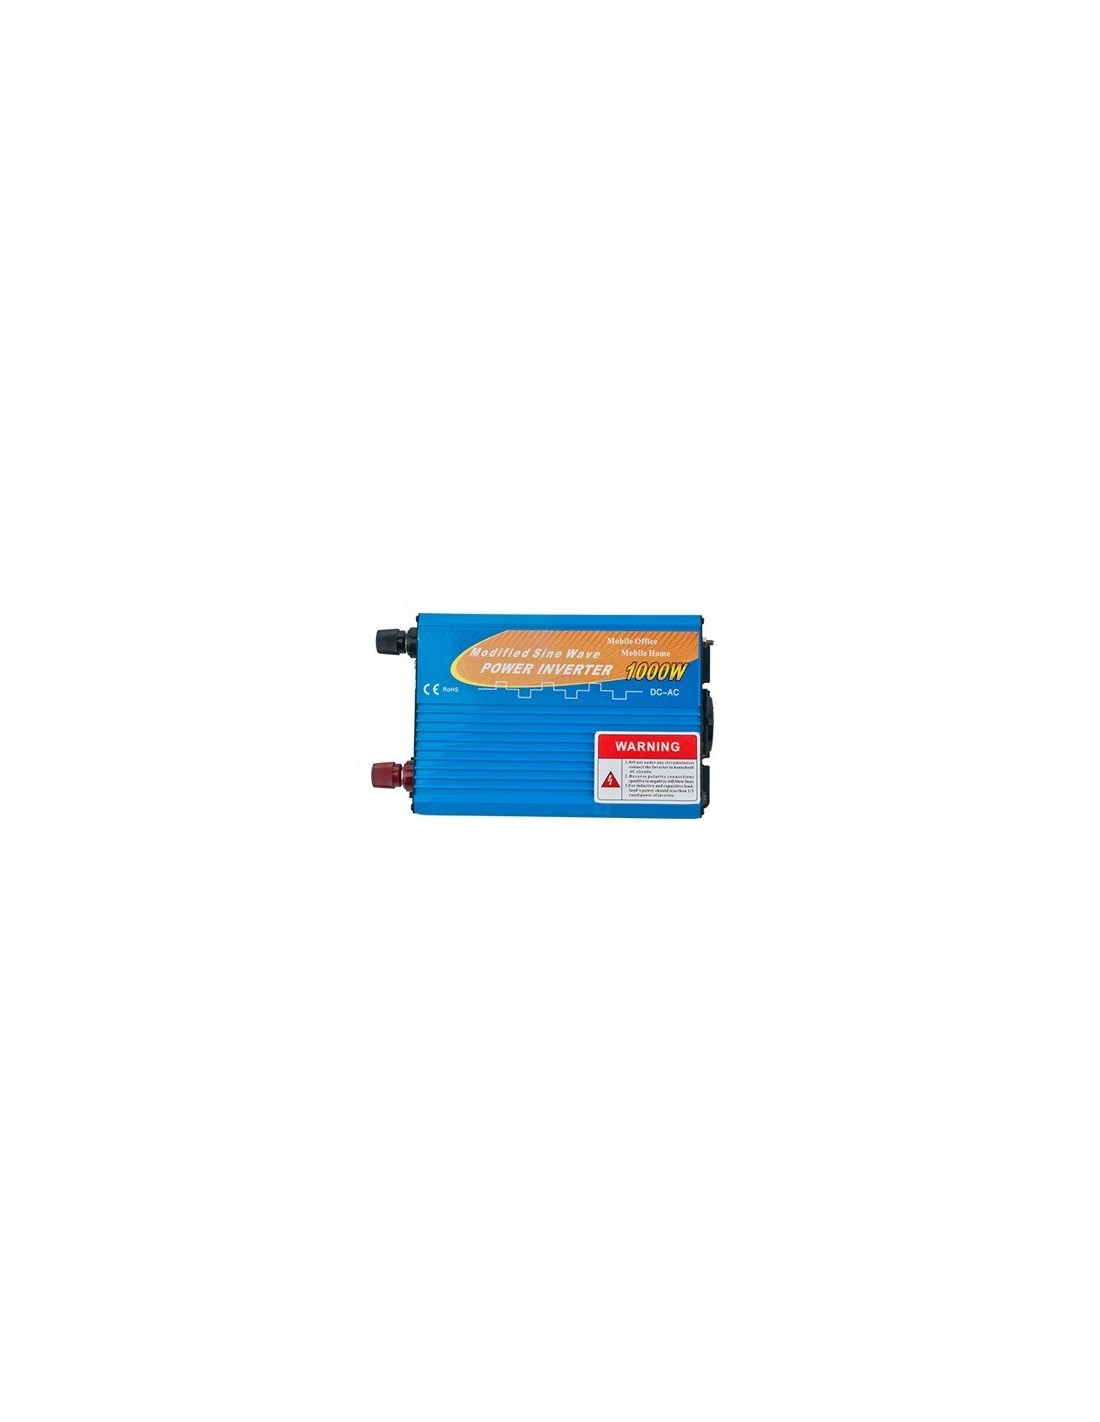 Kit Pannello Solare Batteria Inverter : Kit solare baita w v base pannello regolatore